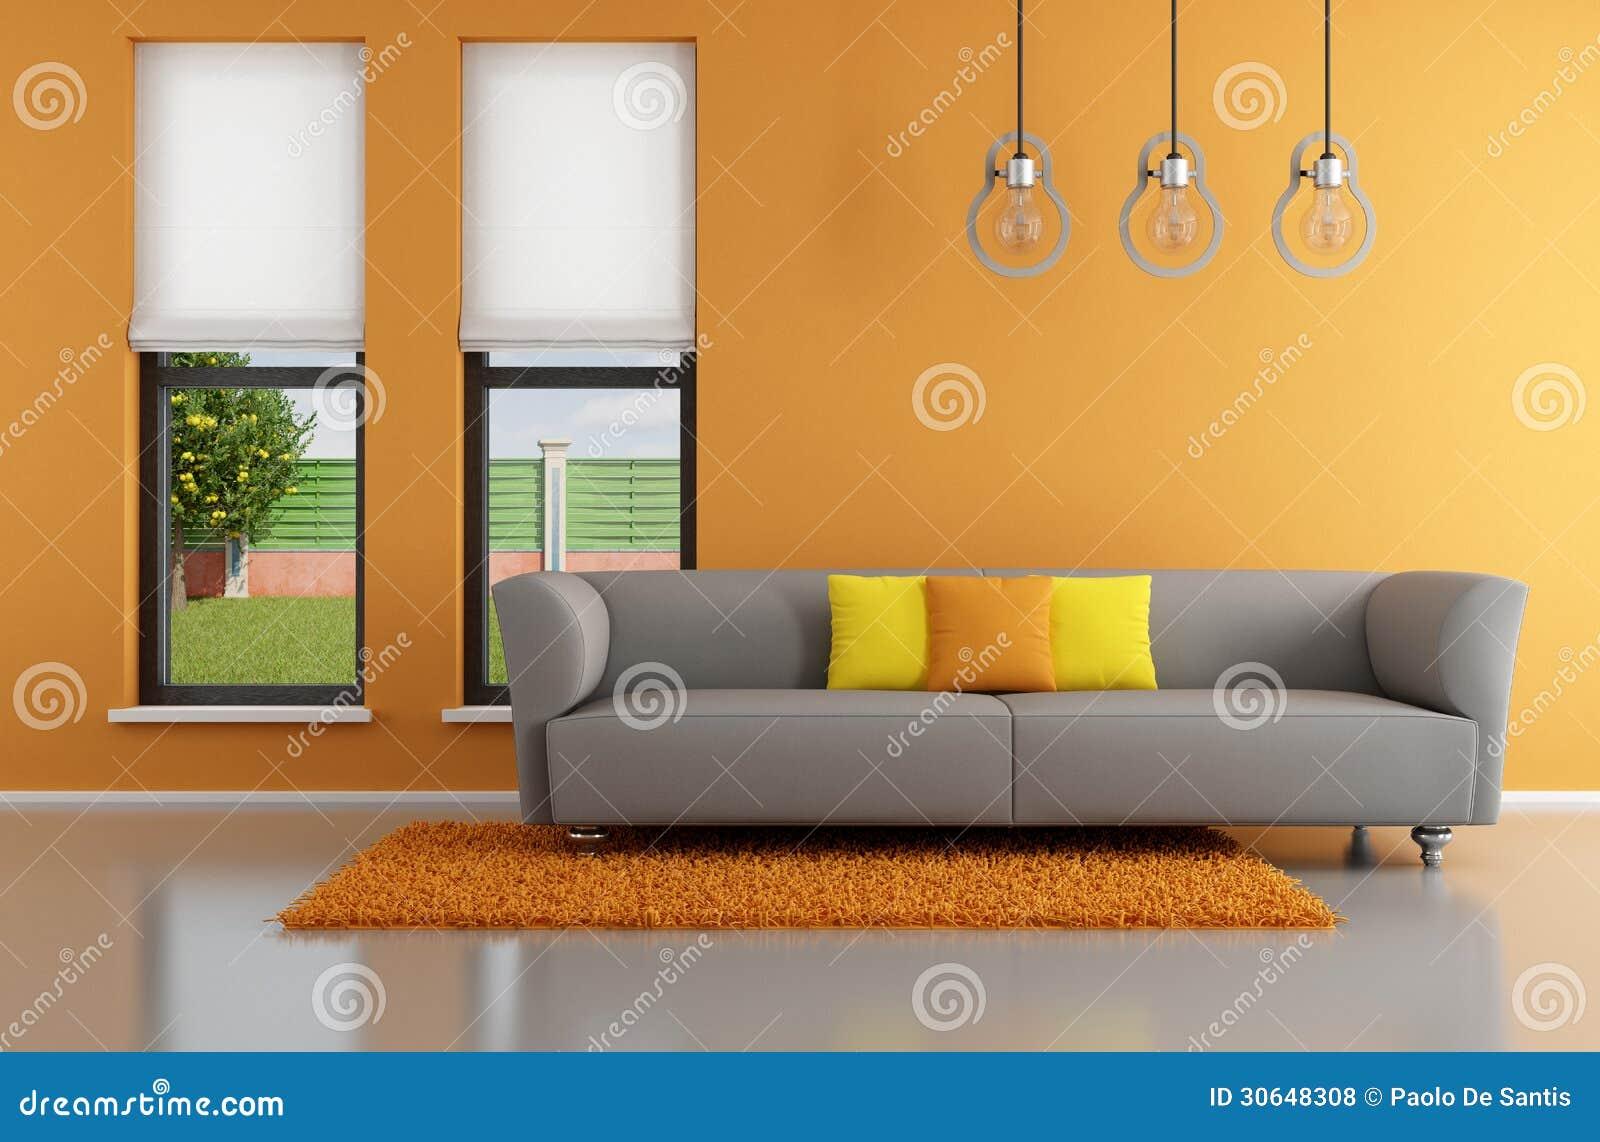 Minimalist Orange Living Room Royalty Free Stock Photos Image 30648308